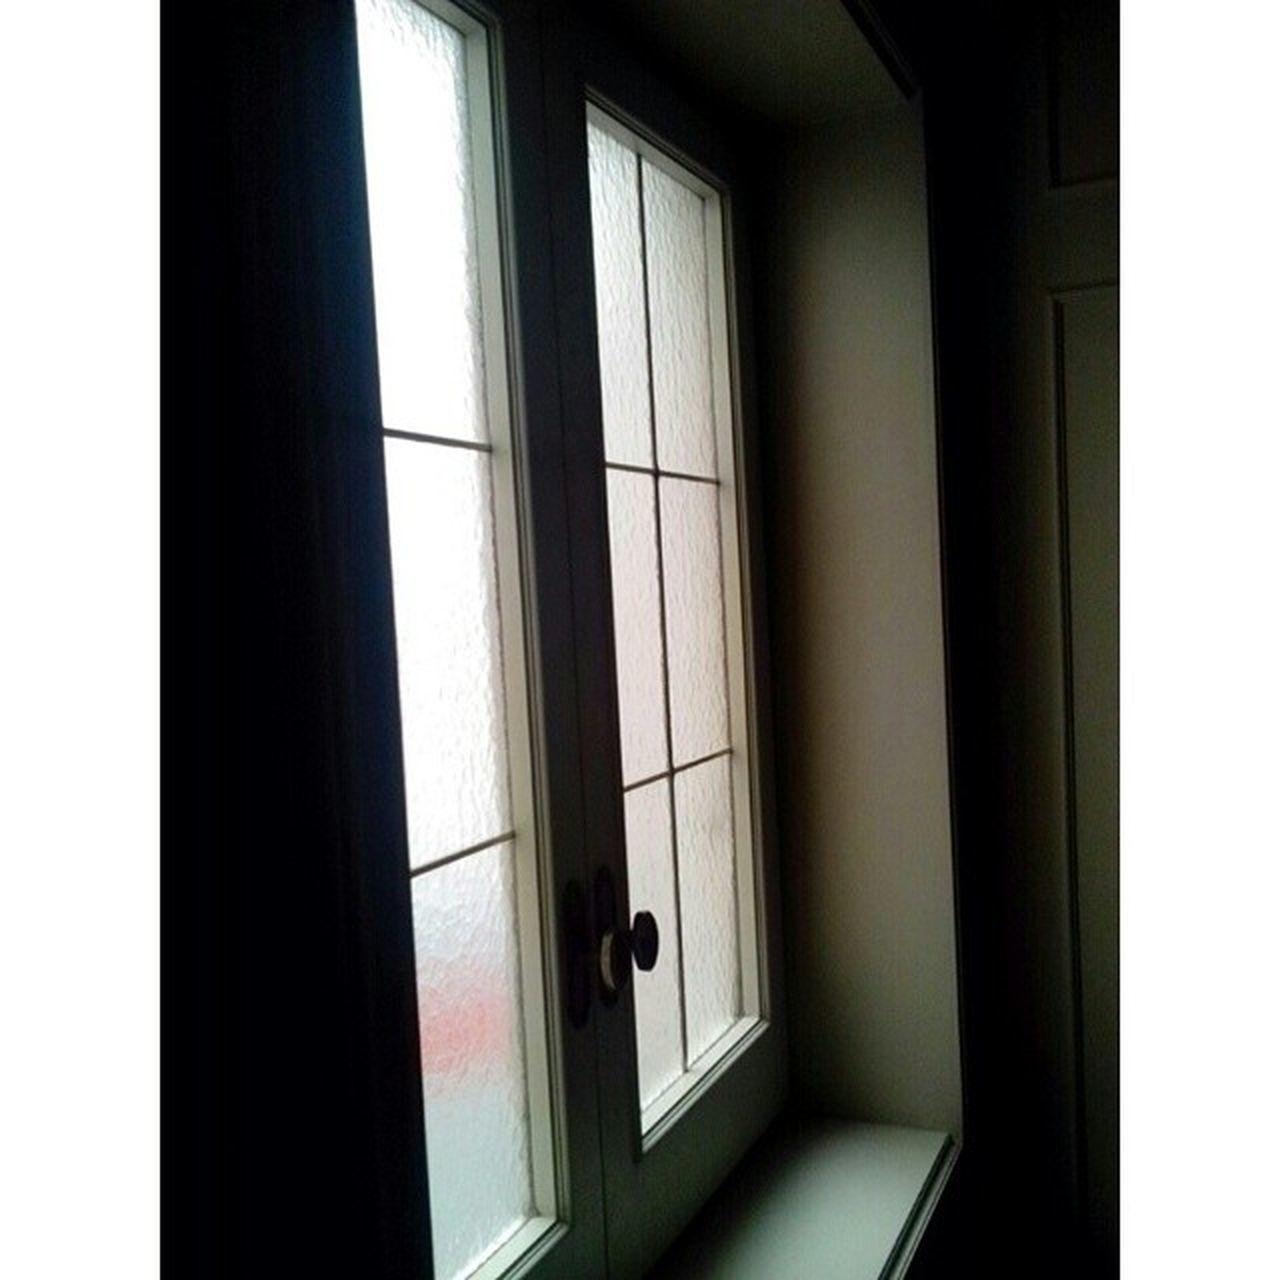 window, indoors, door, home interior, day, no people, domestic room, architecture